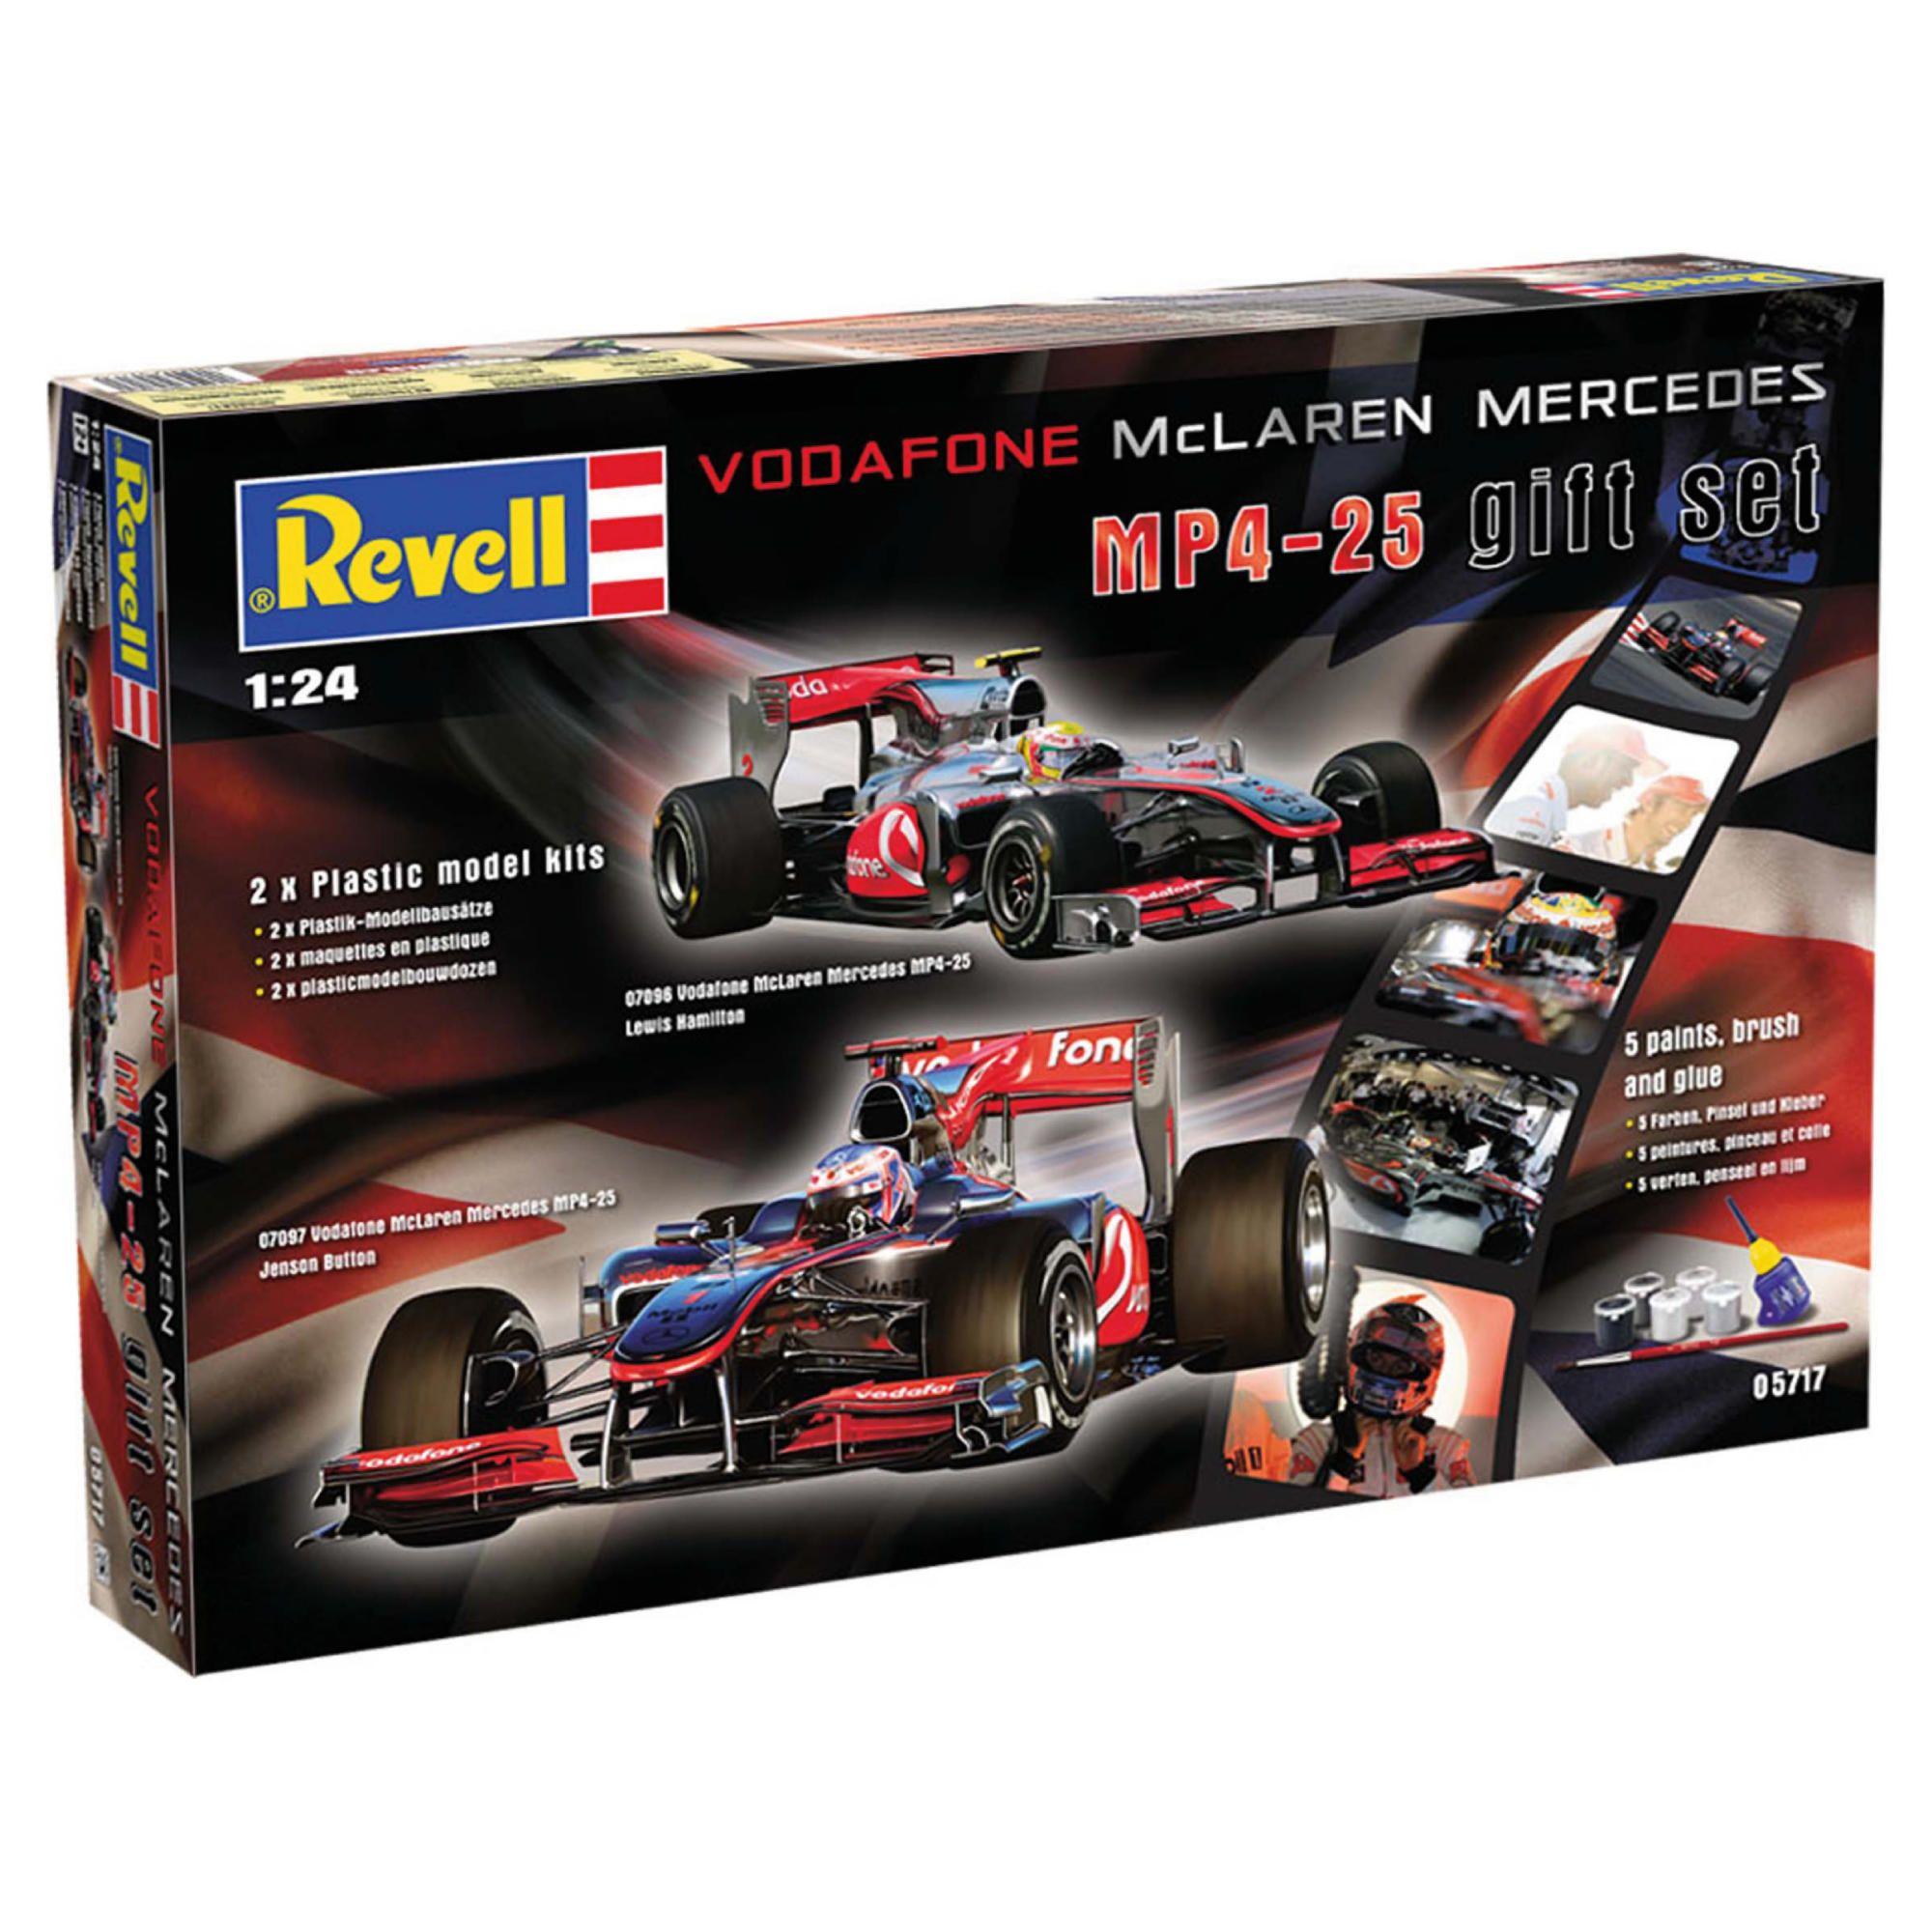 Mercedes Benz Souvenir Shop: Revell Gift Set Maclaren Mercedes Formula 1